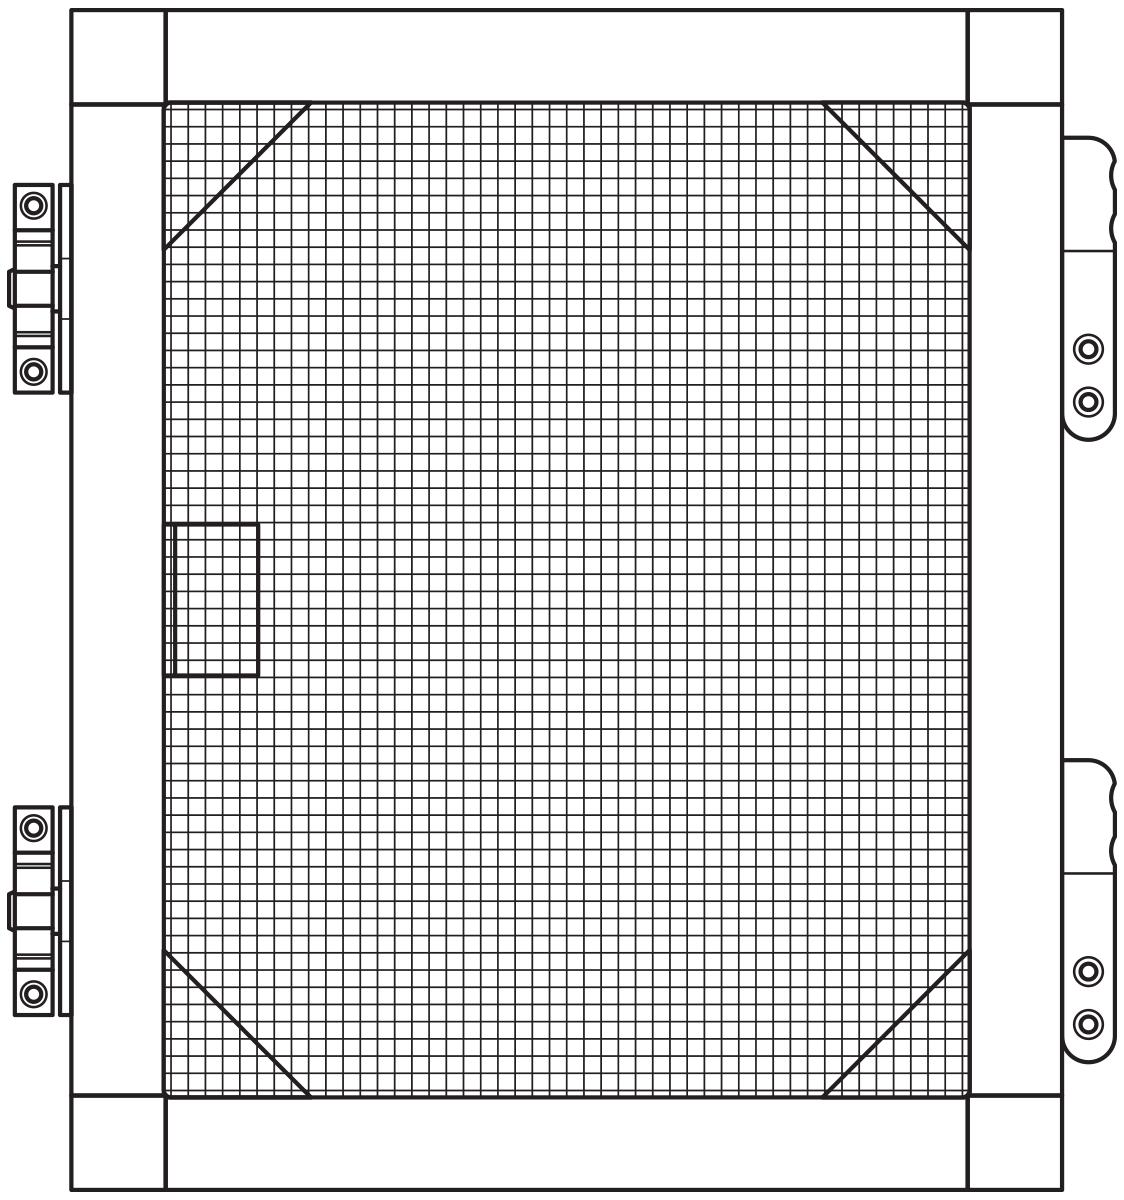 Alu spoljašnji fiksni komarnik 17 mm